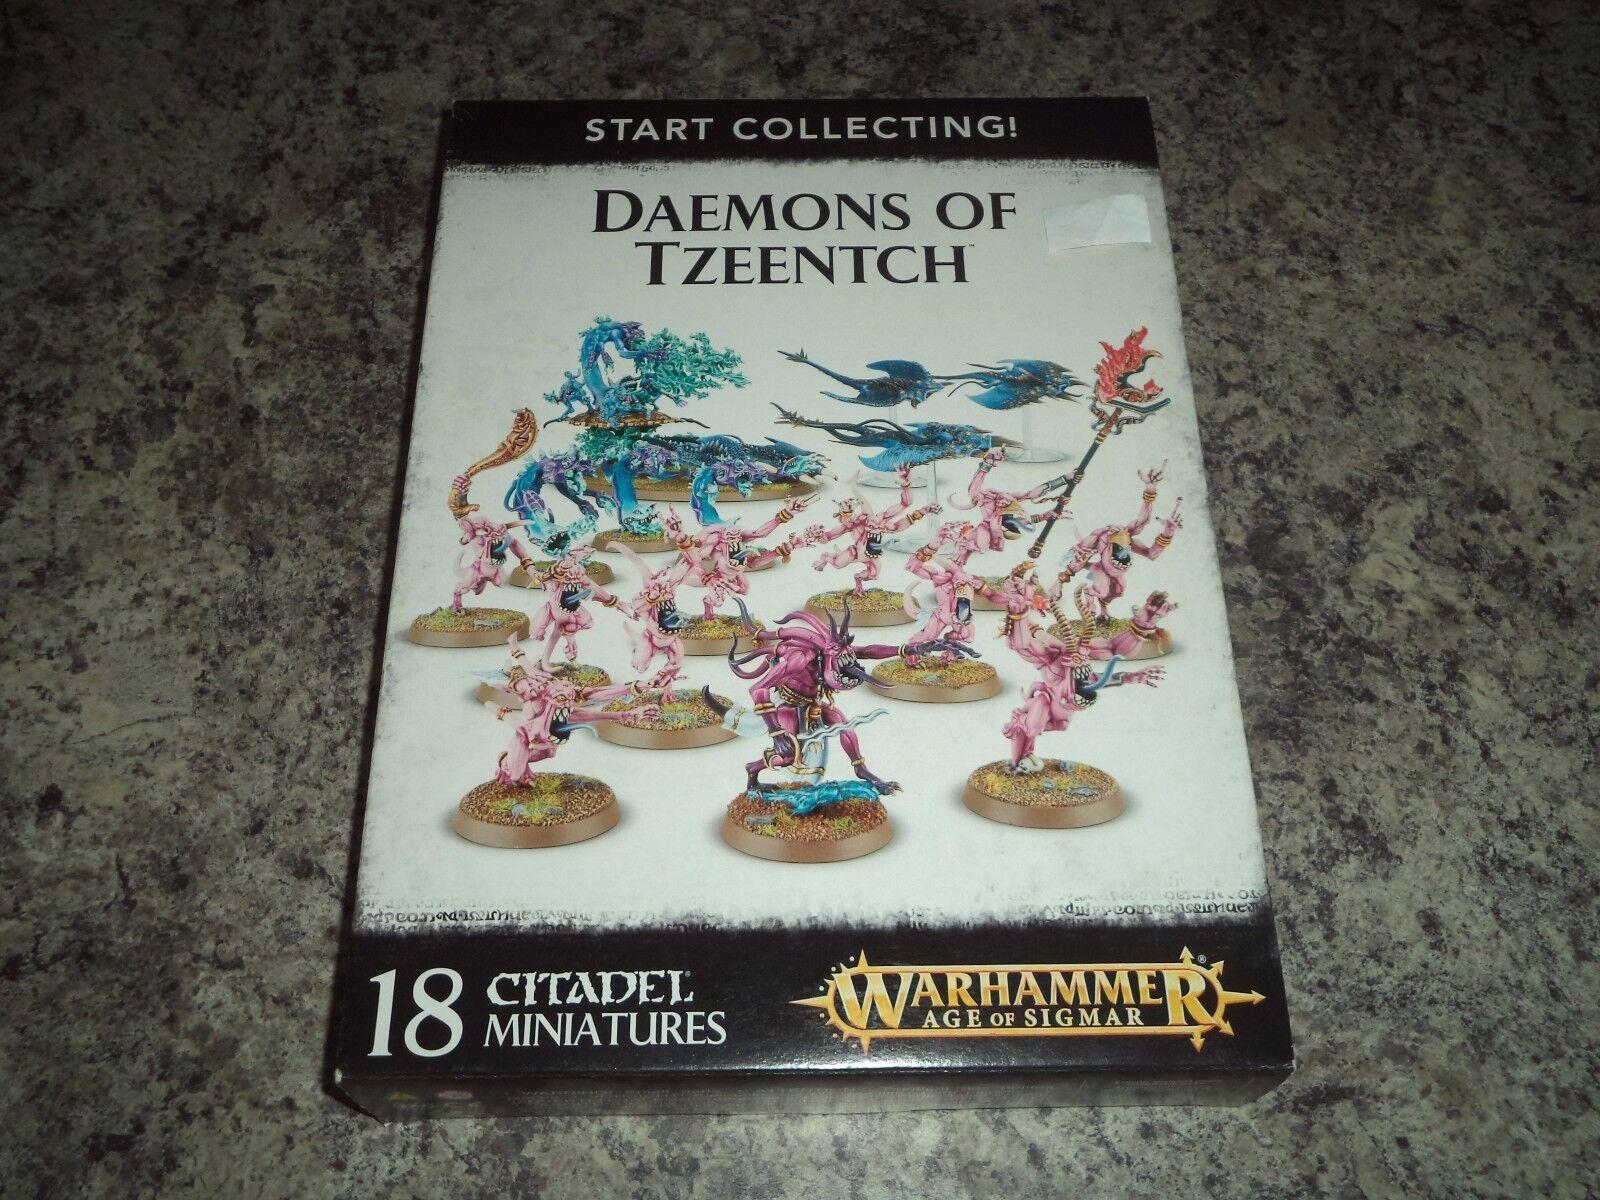 Inicio Recaudación Demonios Of Tzeentch Chaos Demons Warhammer 40k 40,000 Modelo